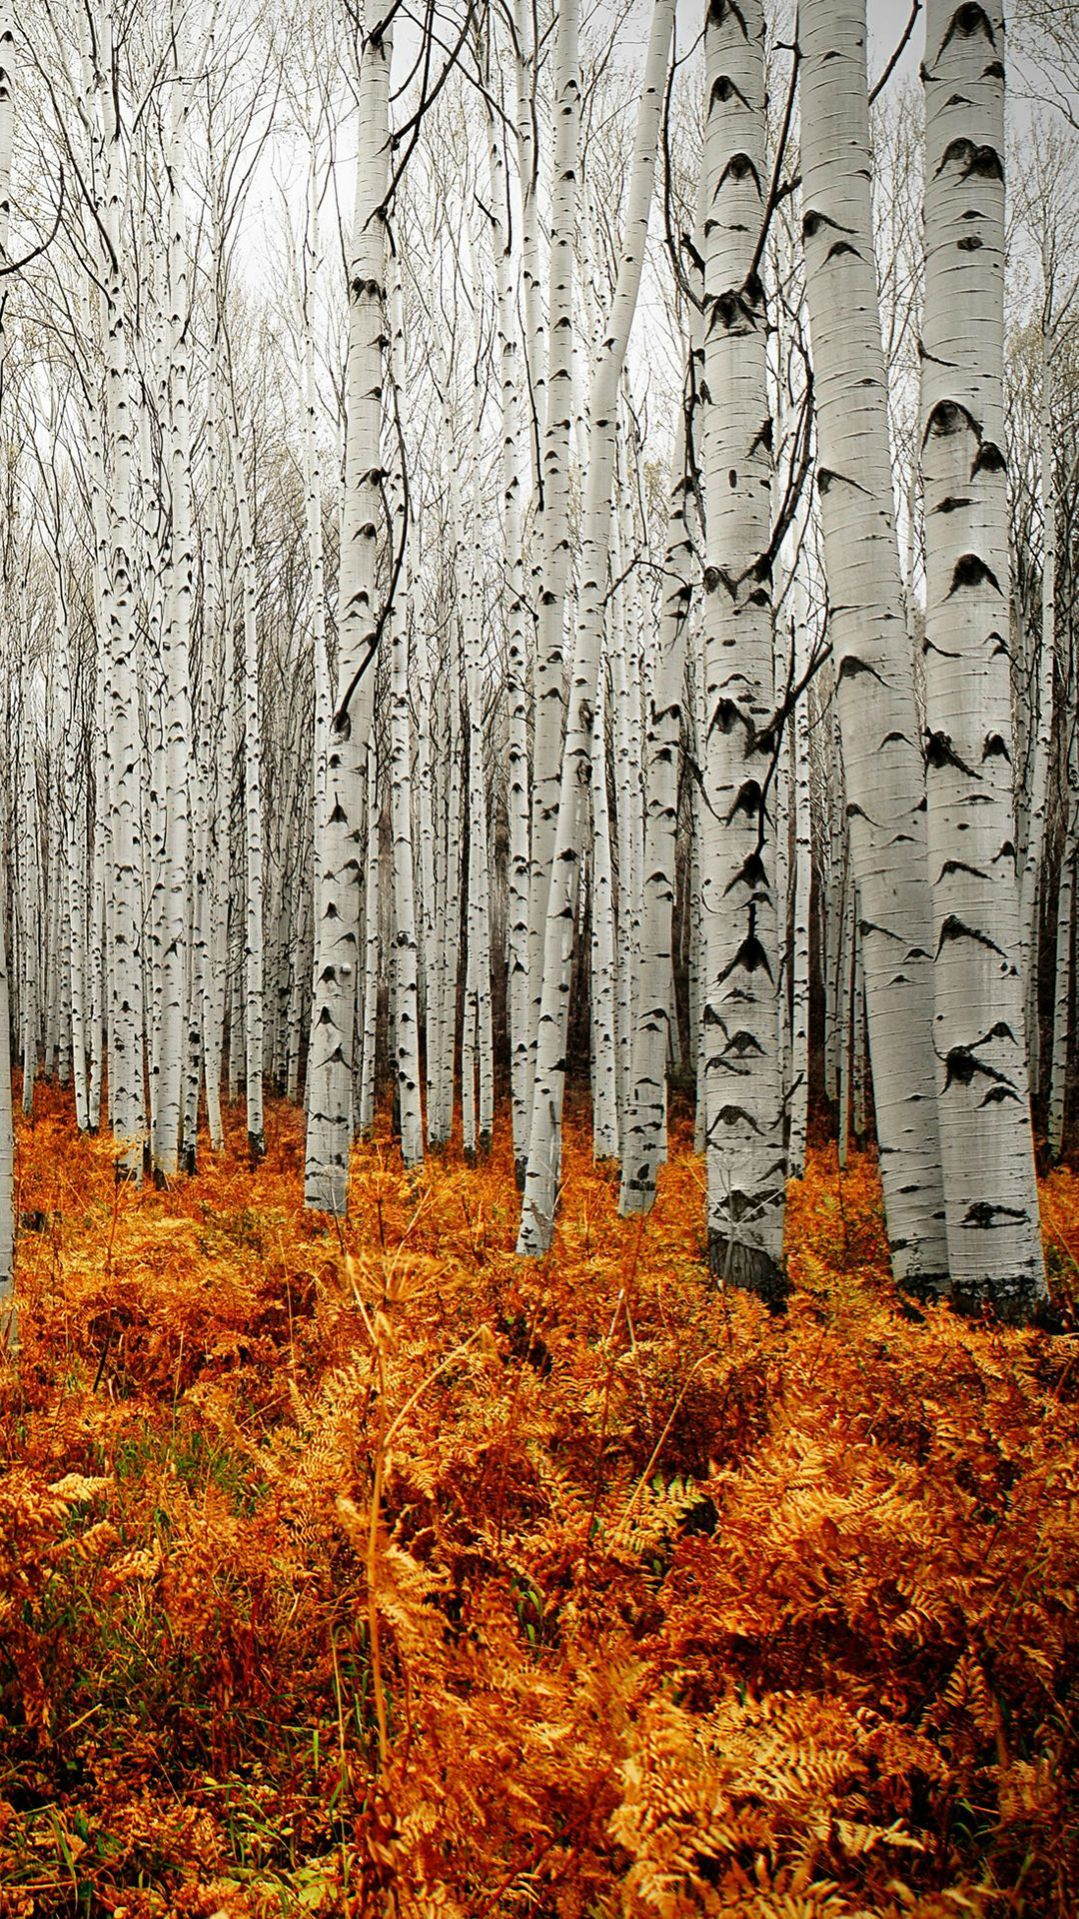 Aspen Tree Wallpaper Aspen Trees In Fall T   Psnsuorg 1079x1919